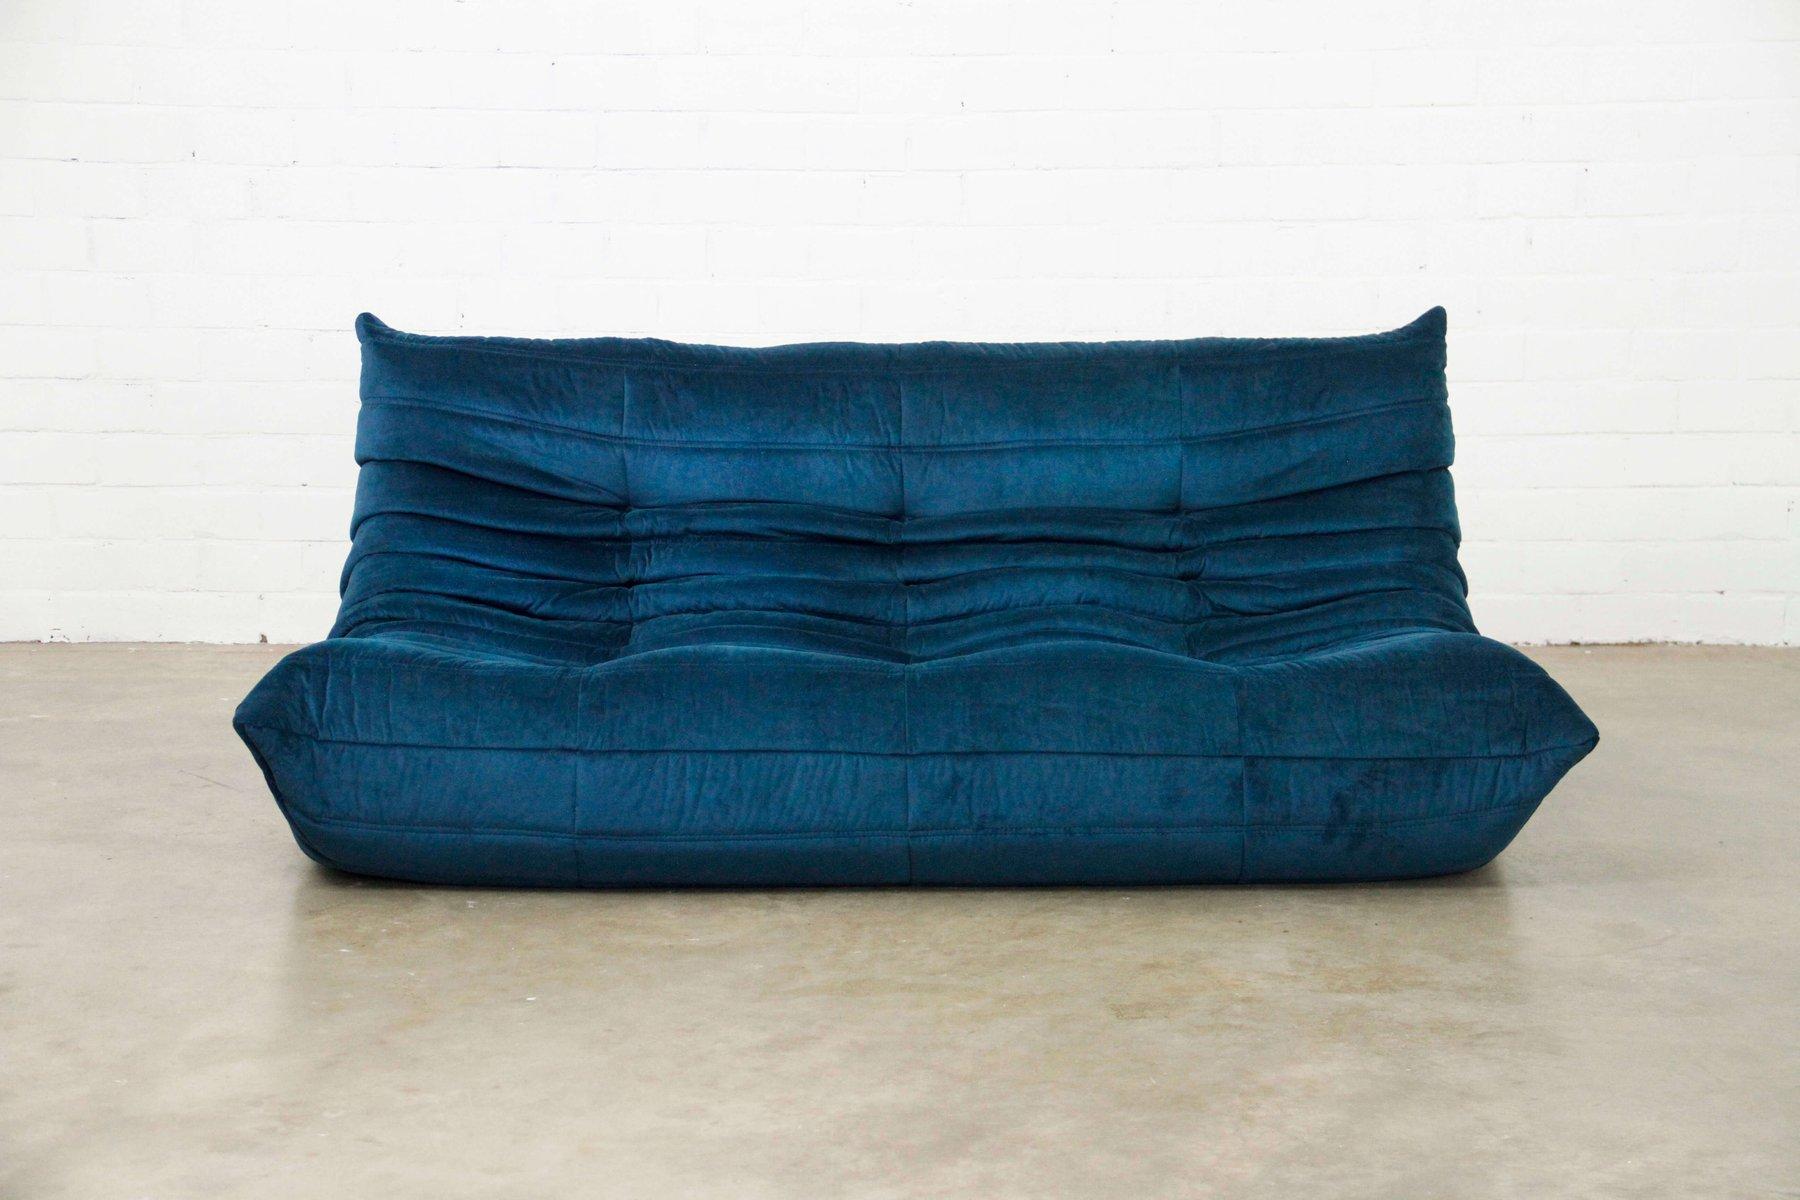 Togo Sofa In Petrol Blue By Michel Ducaroy For Ligne Roset 1970s